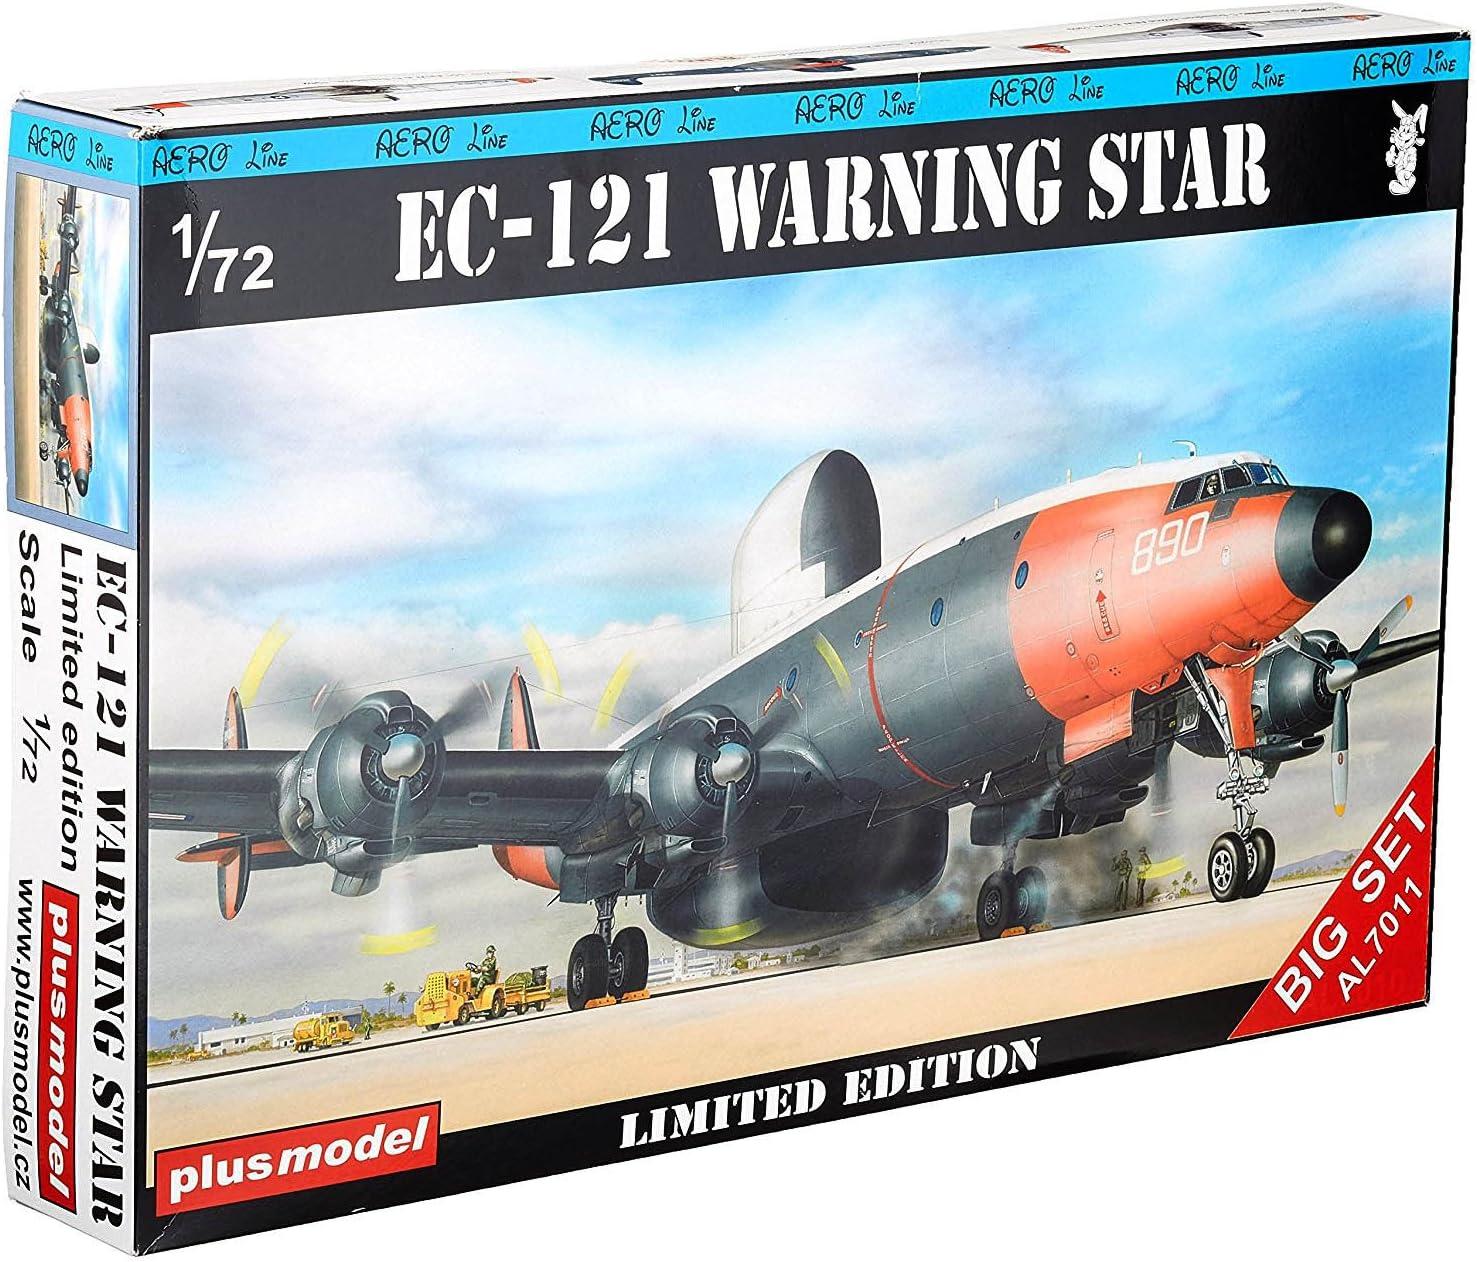 Plus model AL7011 EC-121 Warning Star Big set in 1:72